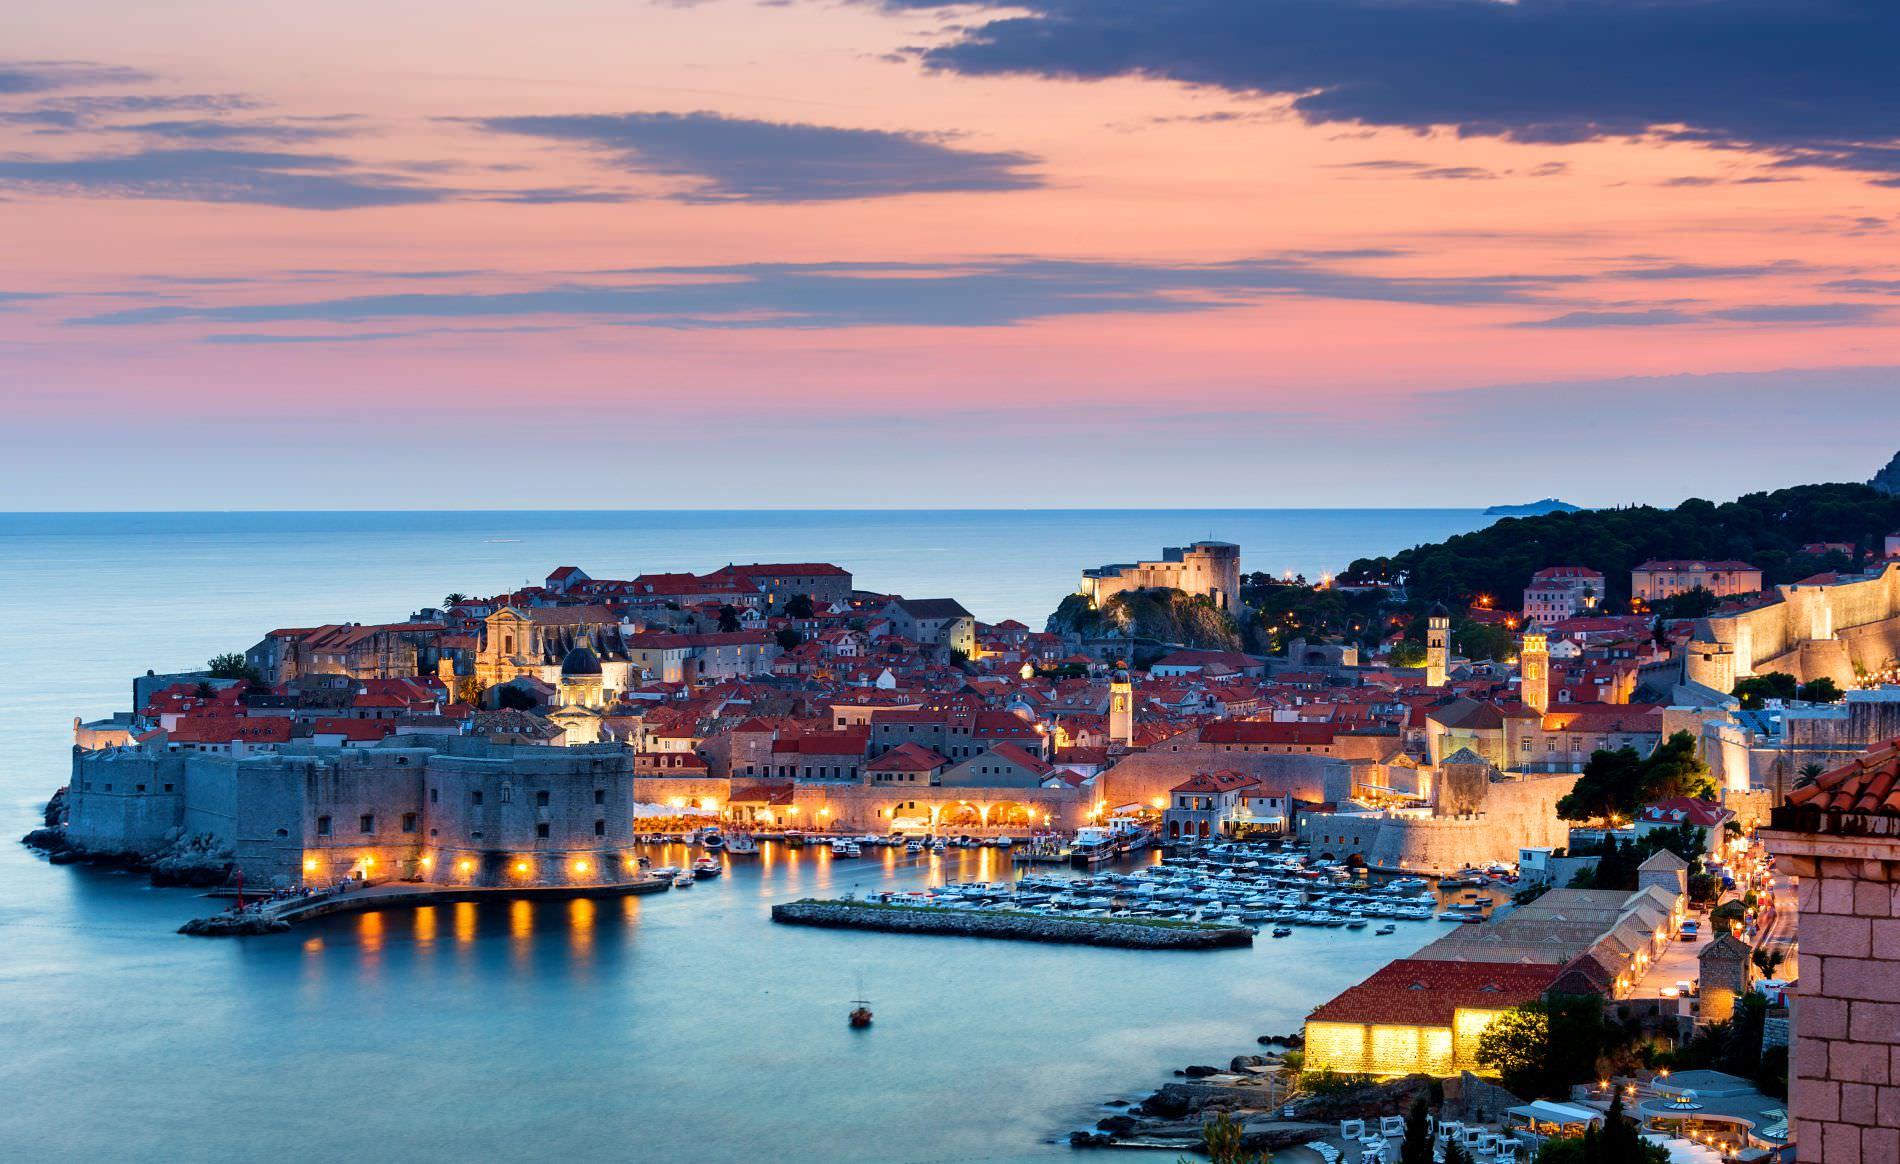 Travelpass.gr - Ντουμπρόβνικ: Ντουμπρόβνικ: Ένα διαμάντι στις Δαλματικές ακτές